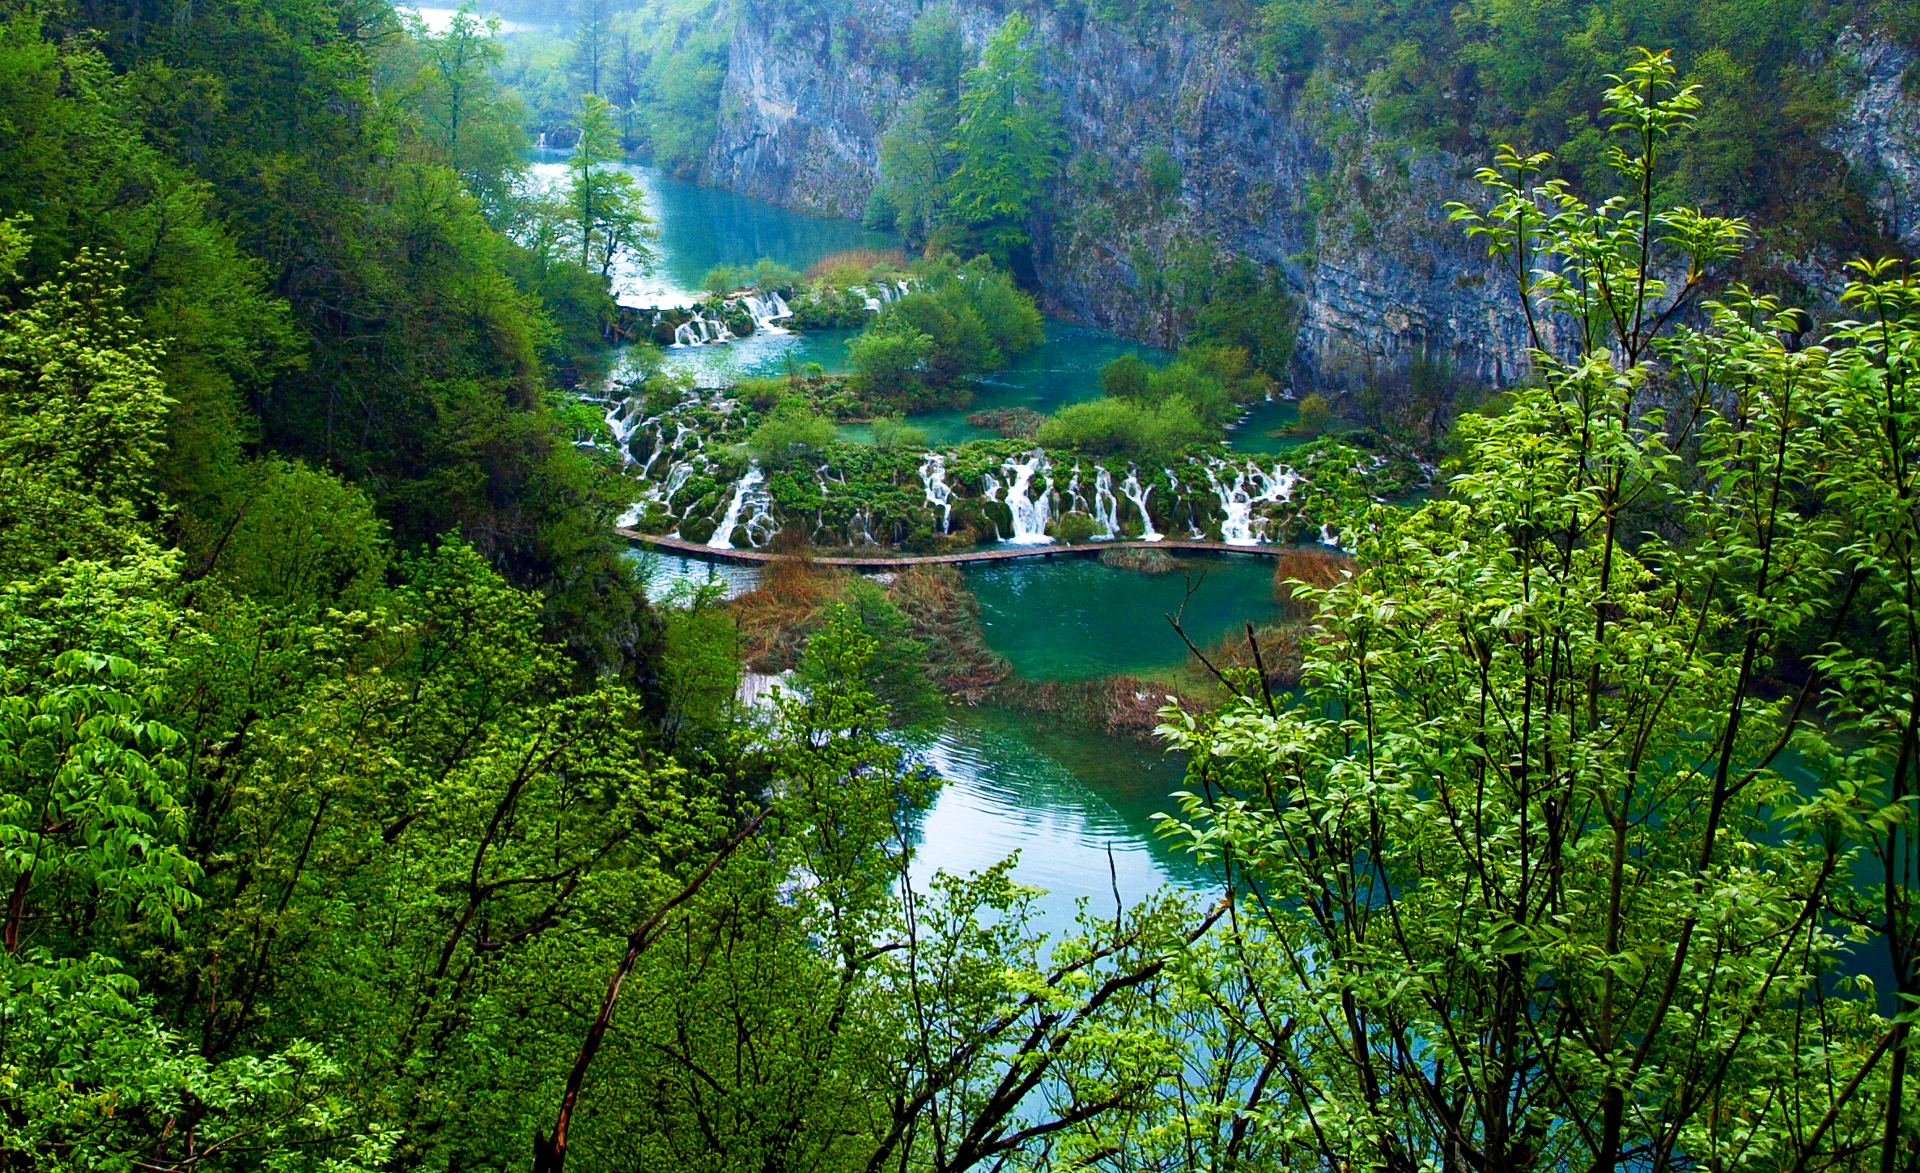 Plitvice lakes national park hd wallpaper background image 1920x1173 id 712018 wallpaper - Plitvice lakes hd ...